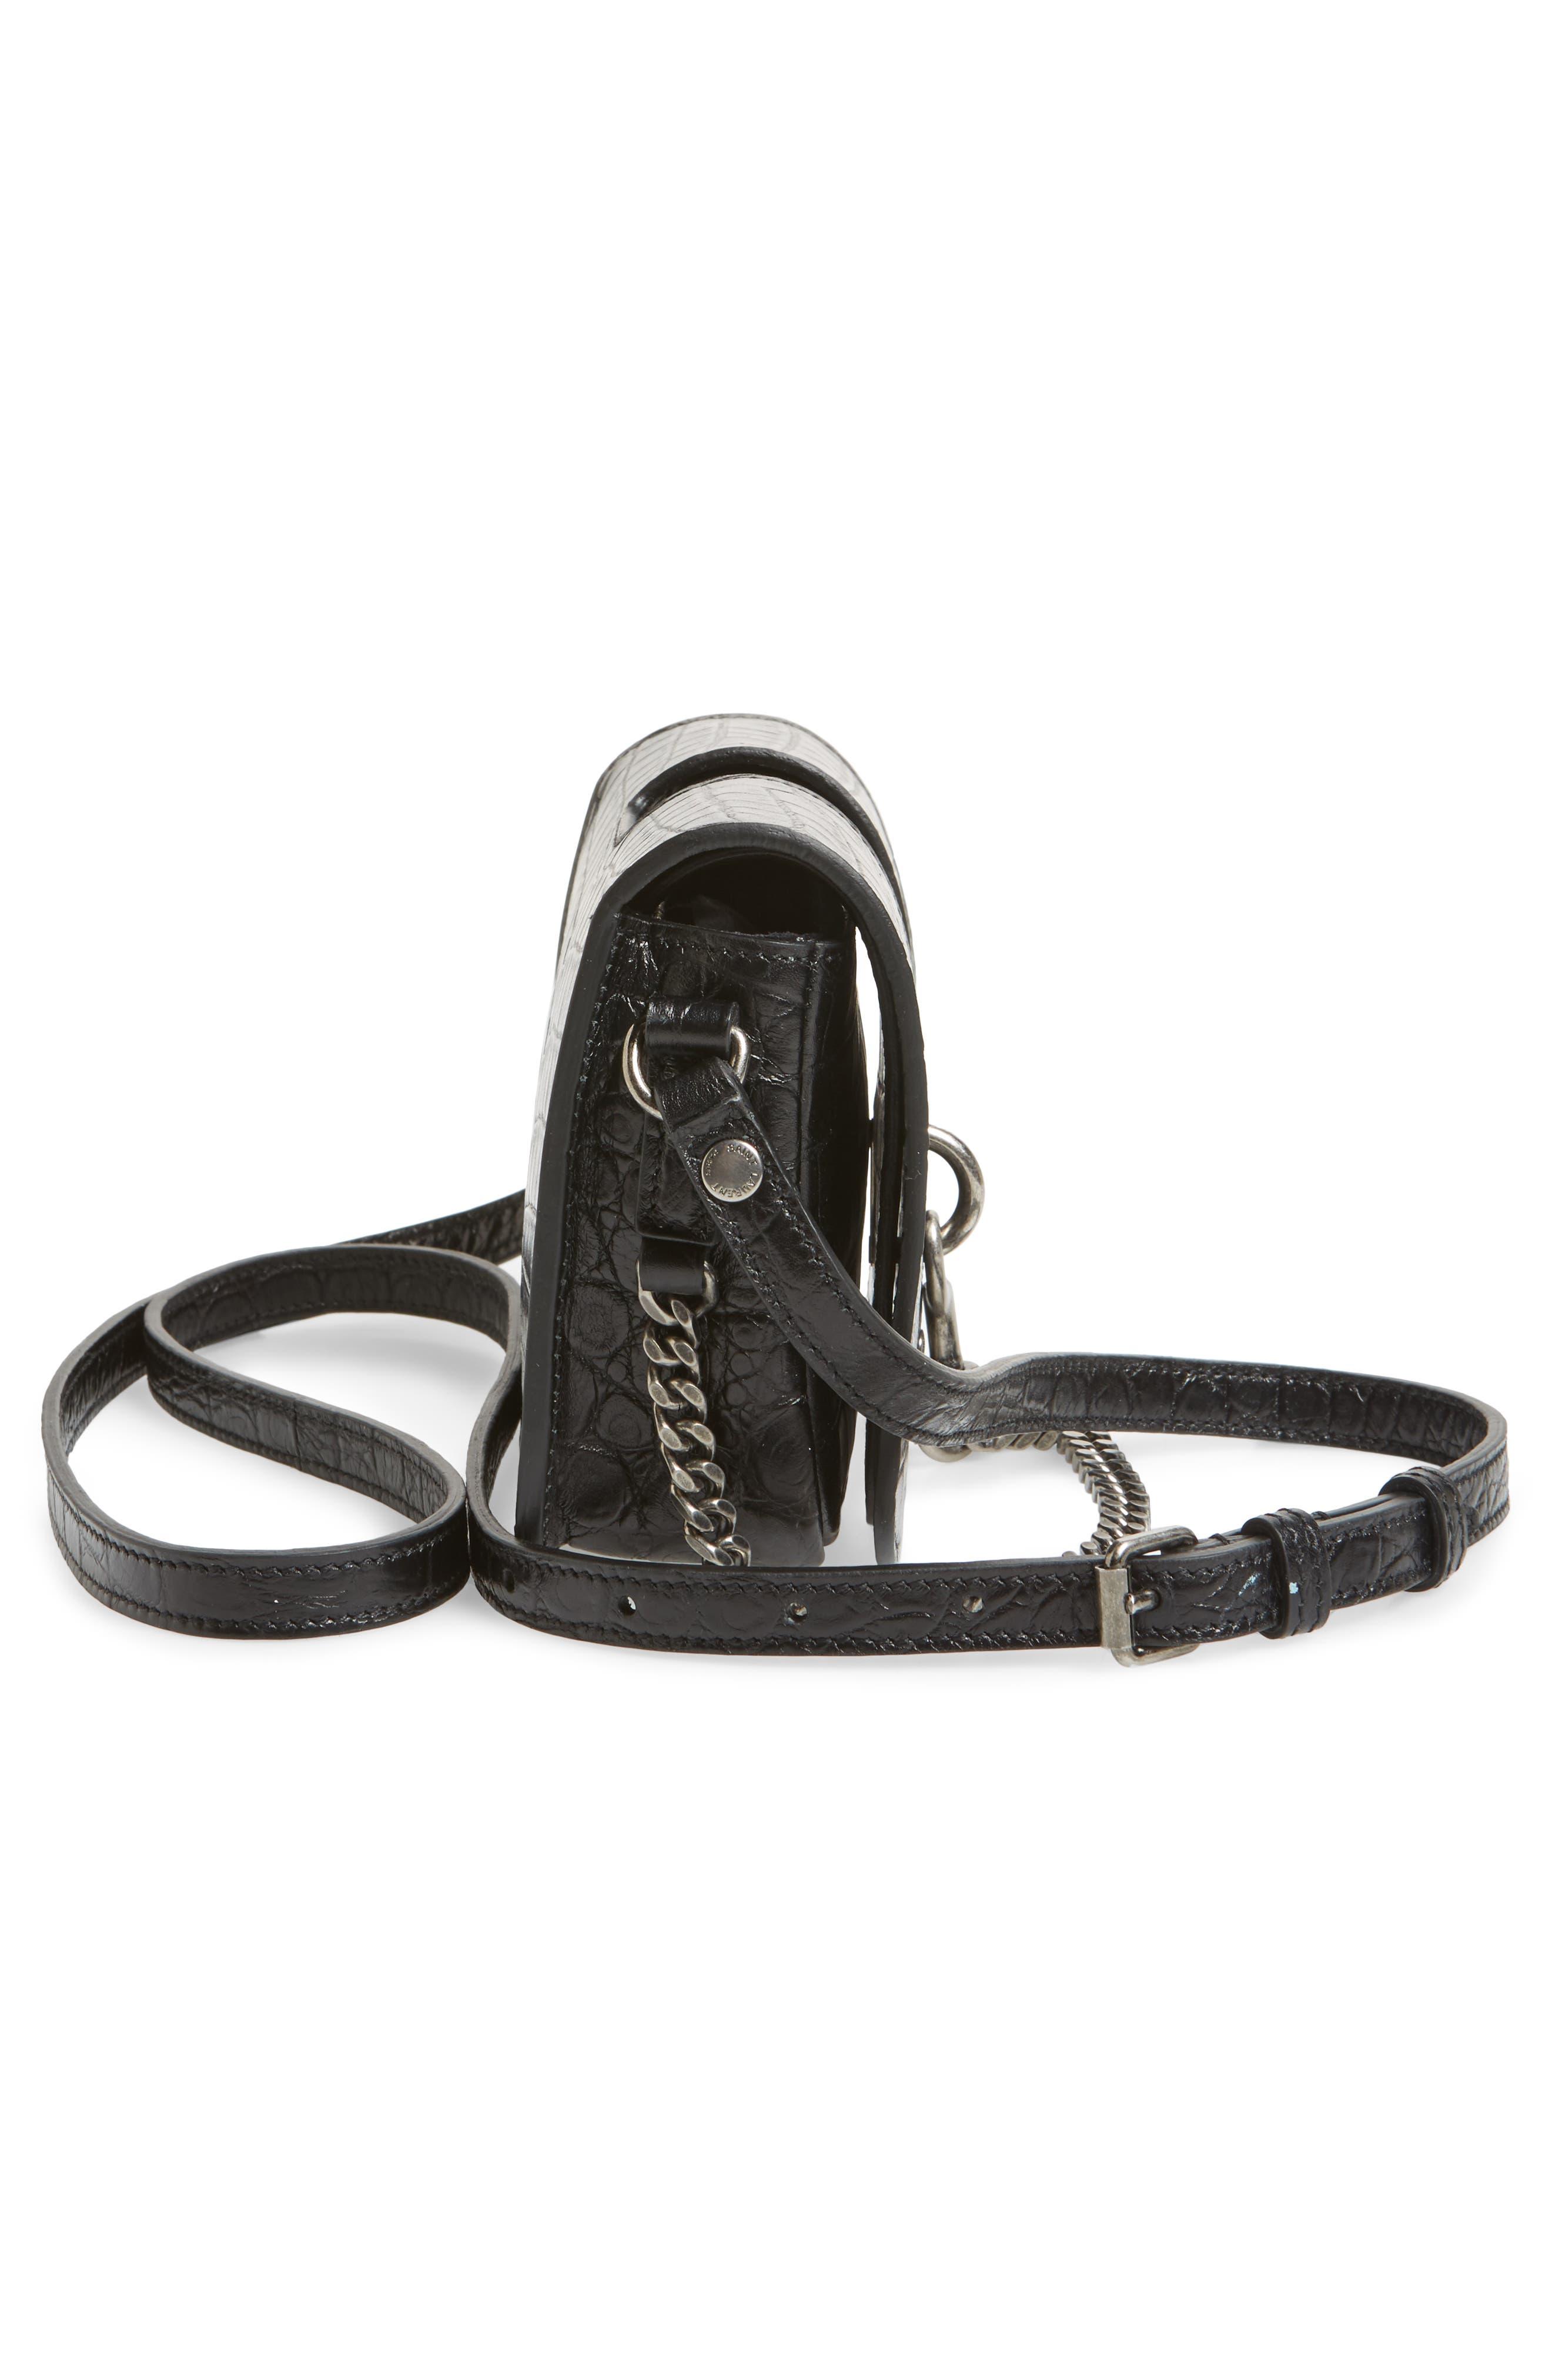 Croc Embossed Leather Crossbody Bag,                             Alternate thumbnail 5, color,                             Noir